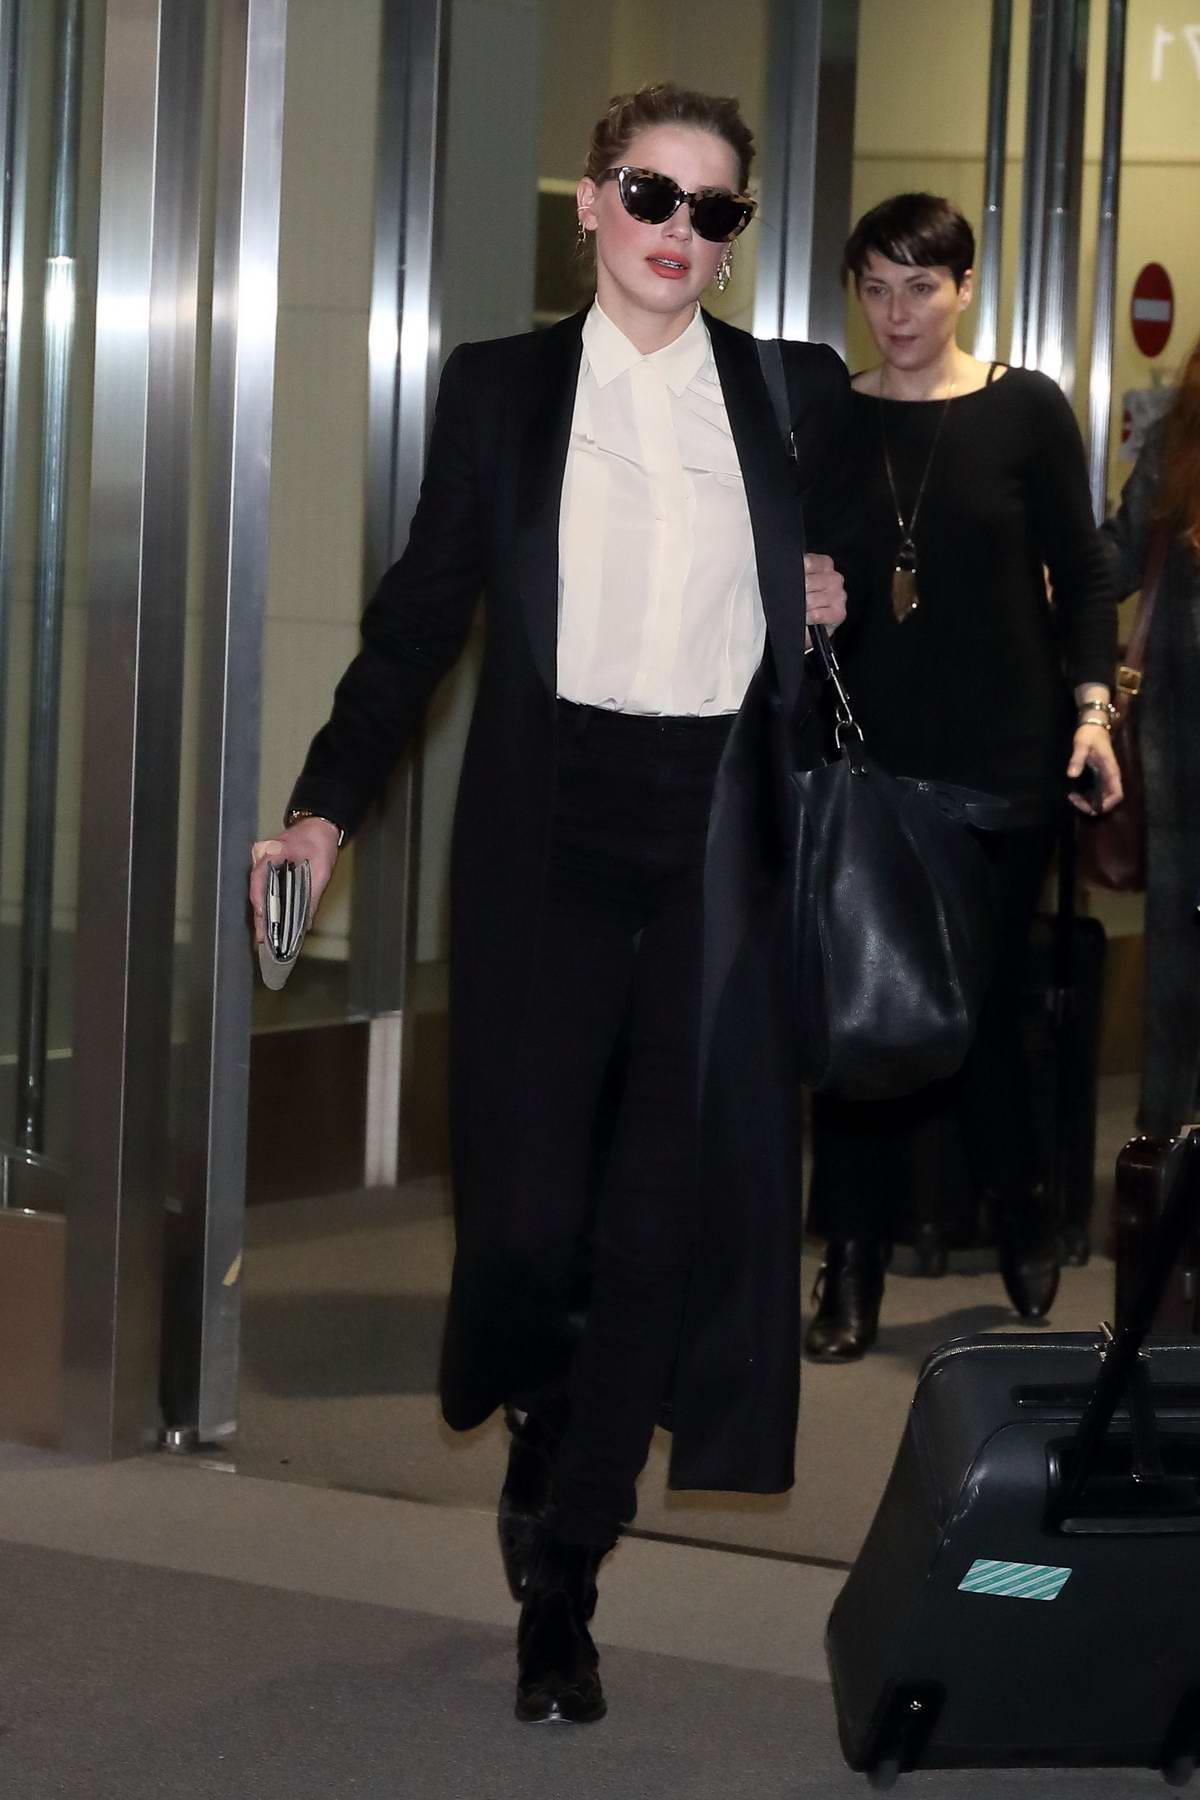 Amber Heard looks chic as she arrives at Narita International Airport in Tokyo, Japan